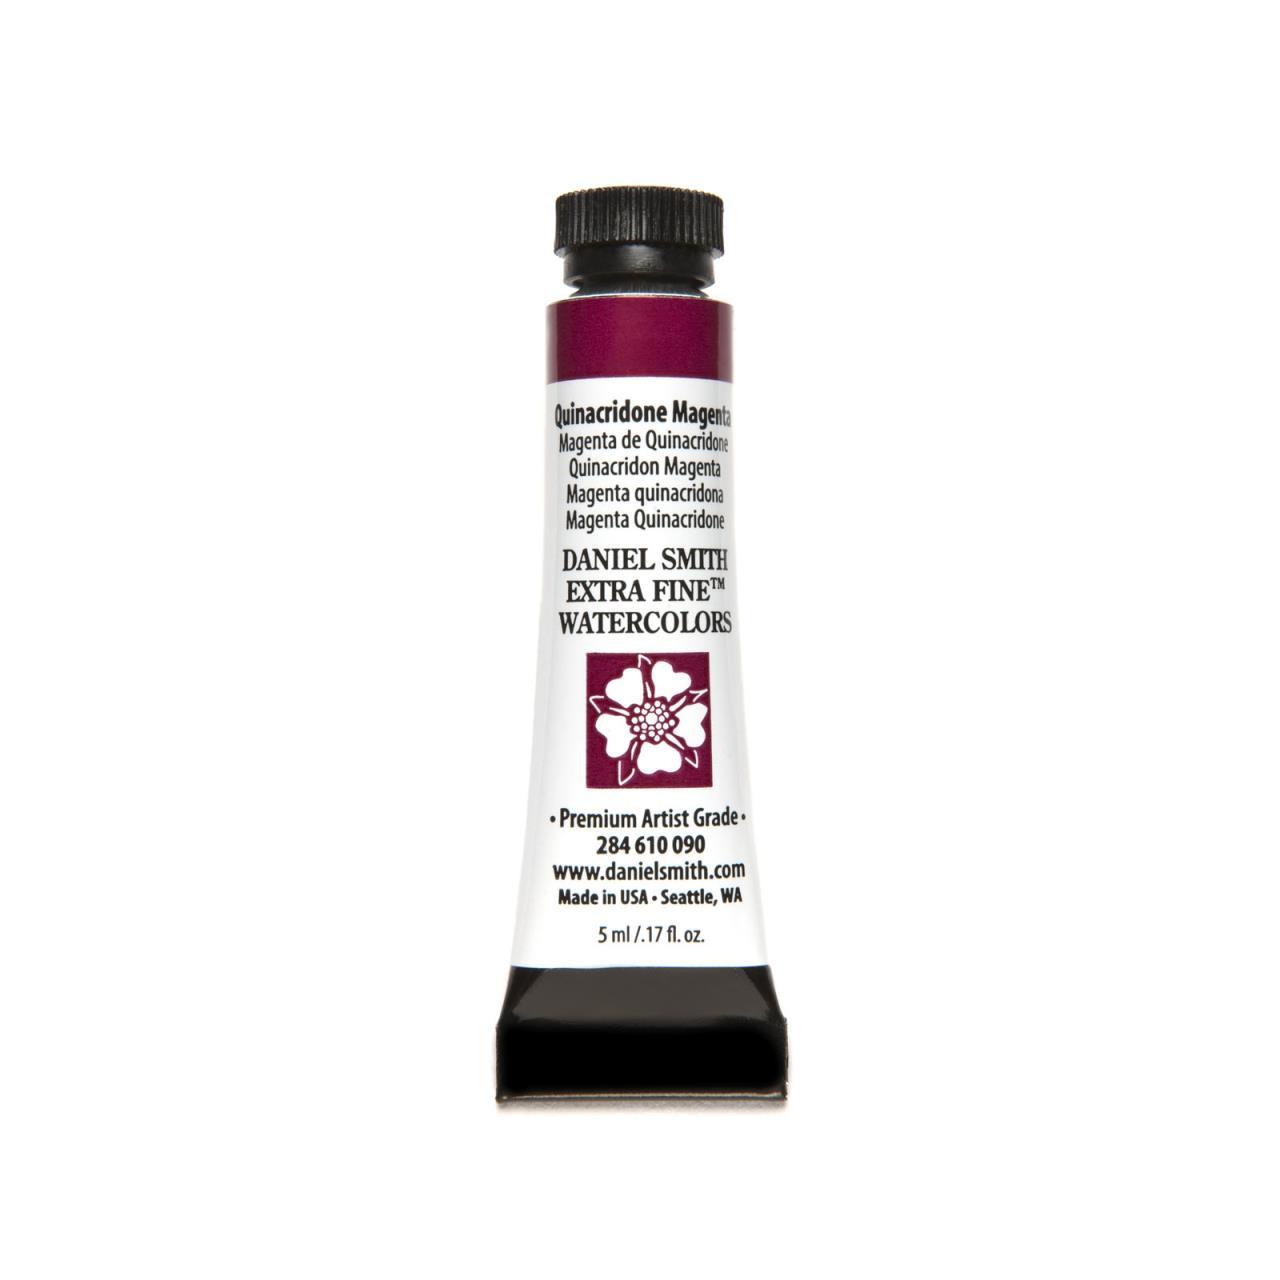 Quinacridone Magenta, DANIEL SMITH Extra Fine Watercolors 5ml Tubes -